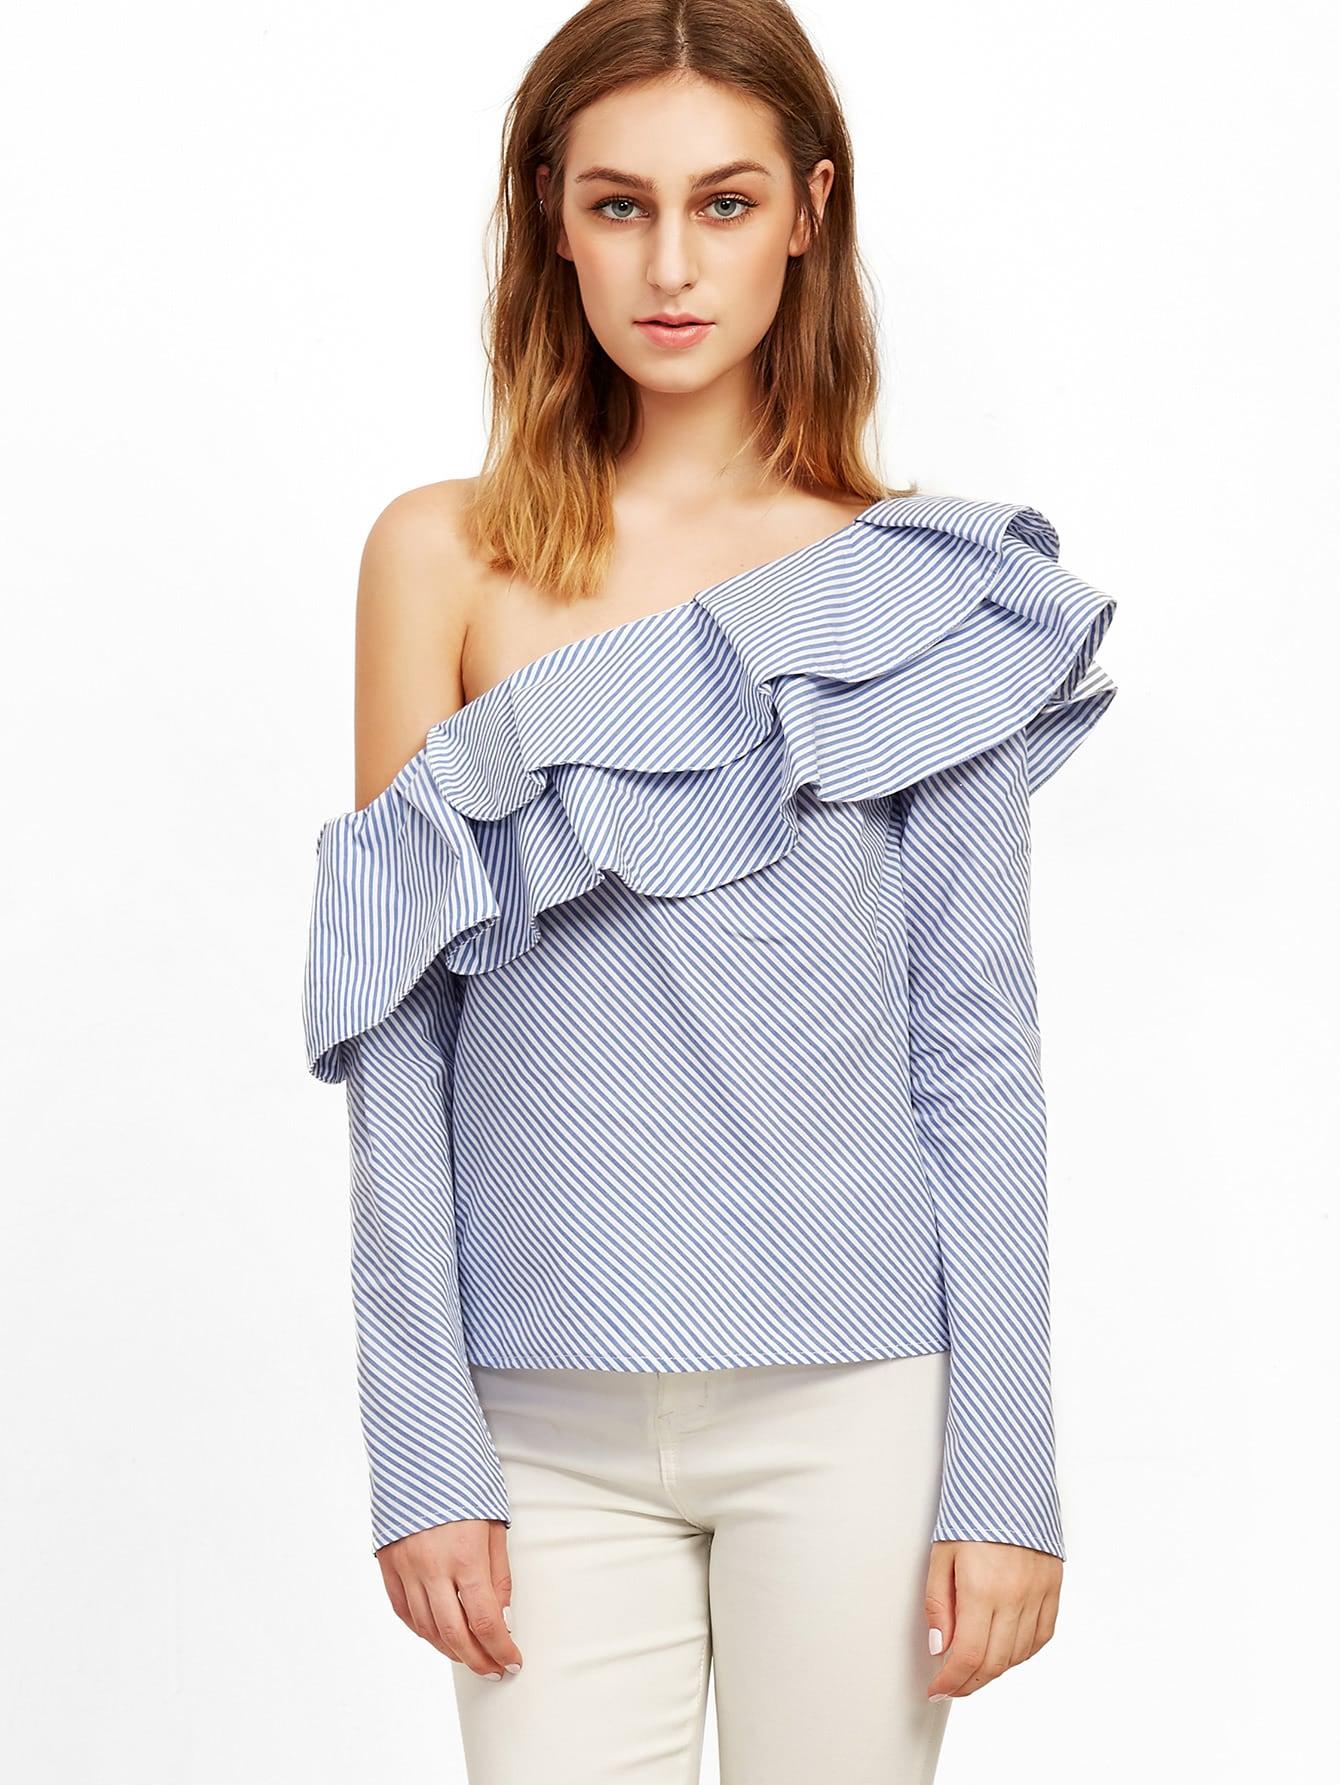 blouse161011704_2